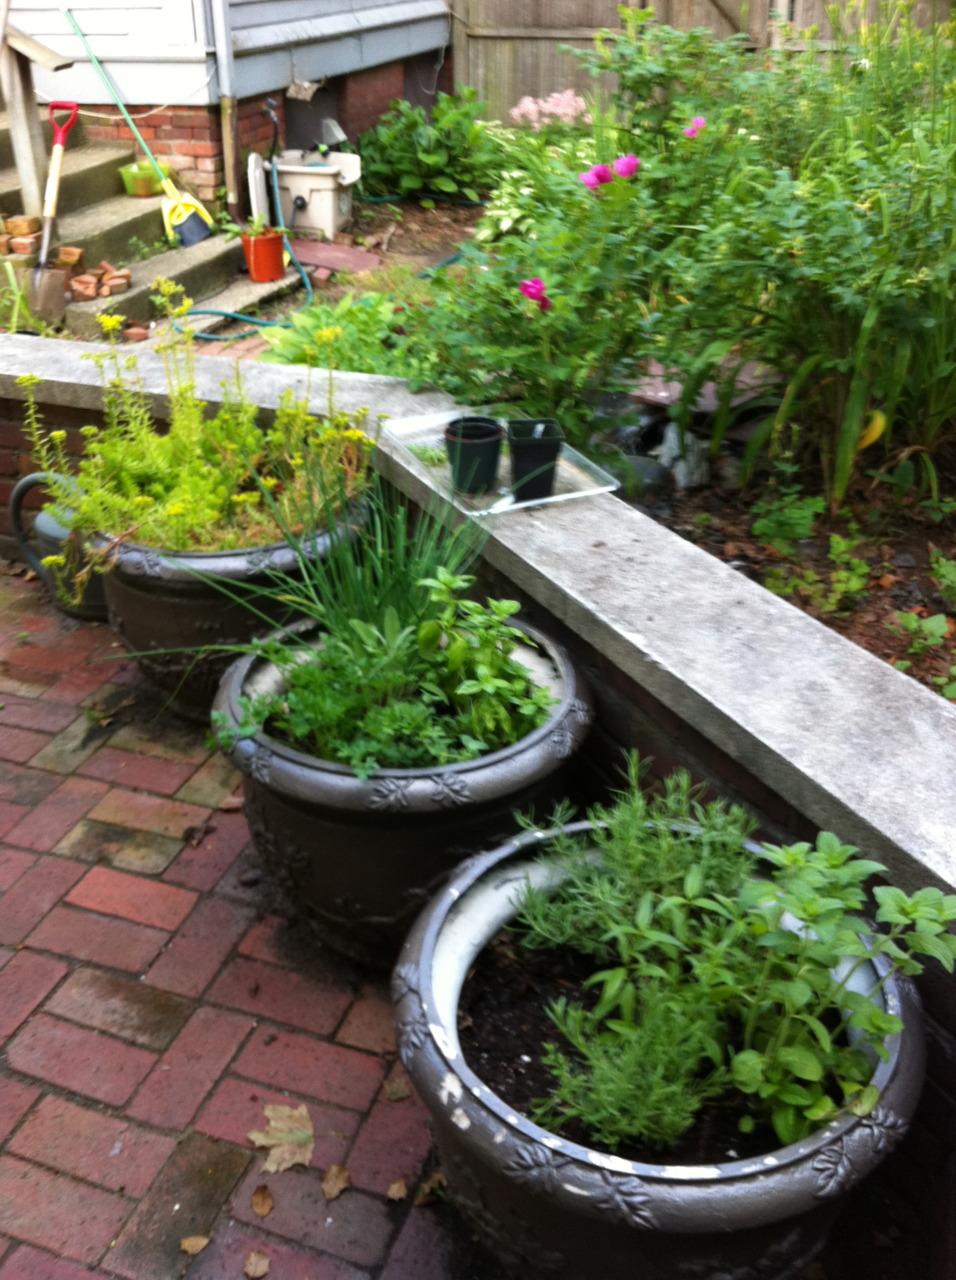 Patio pots - mint, rosemary, lavender, lemon verbena. Chives, basil, oregano, sage. Need thyme! Crazy sedum variety in last.